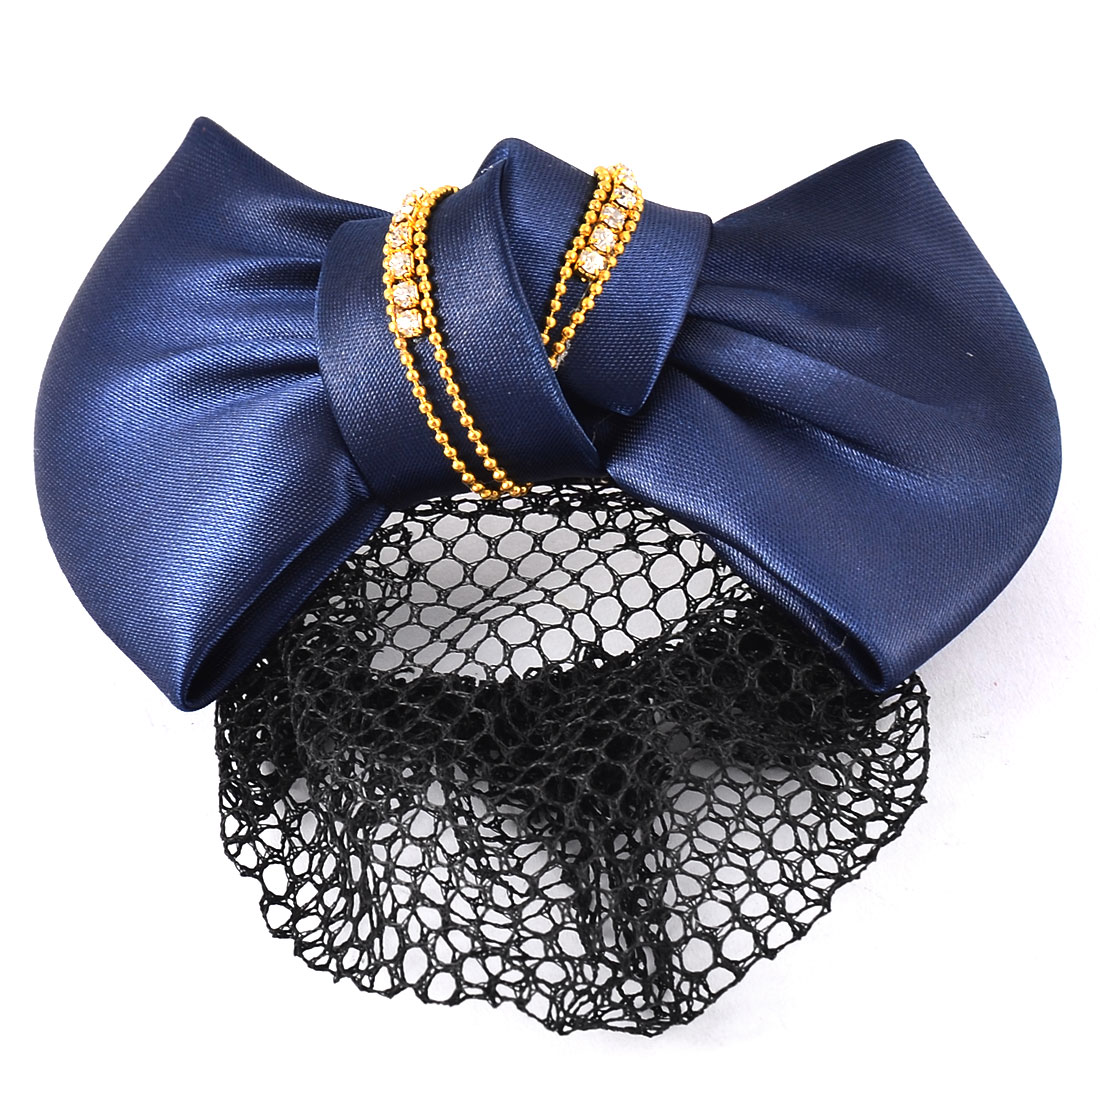 Blue Nylon Bowknot Design Snood Net Holder Hair Clip Hairnet Hairclip for Lady